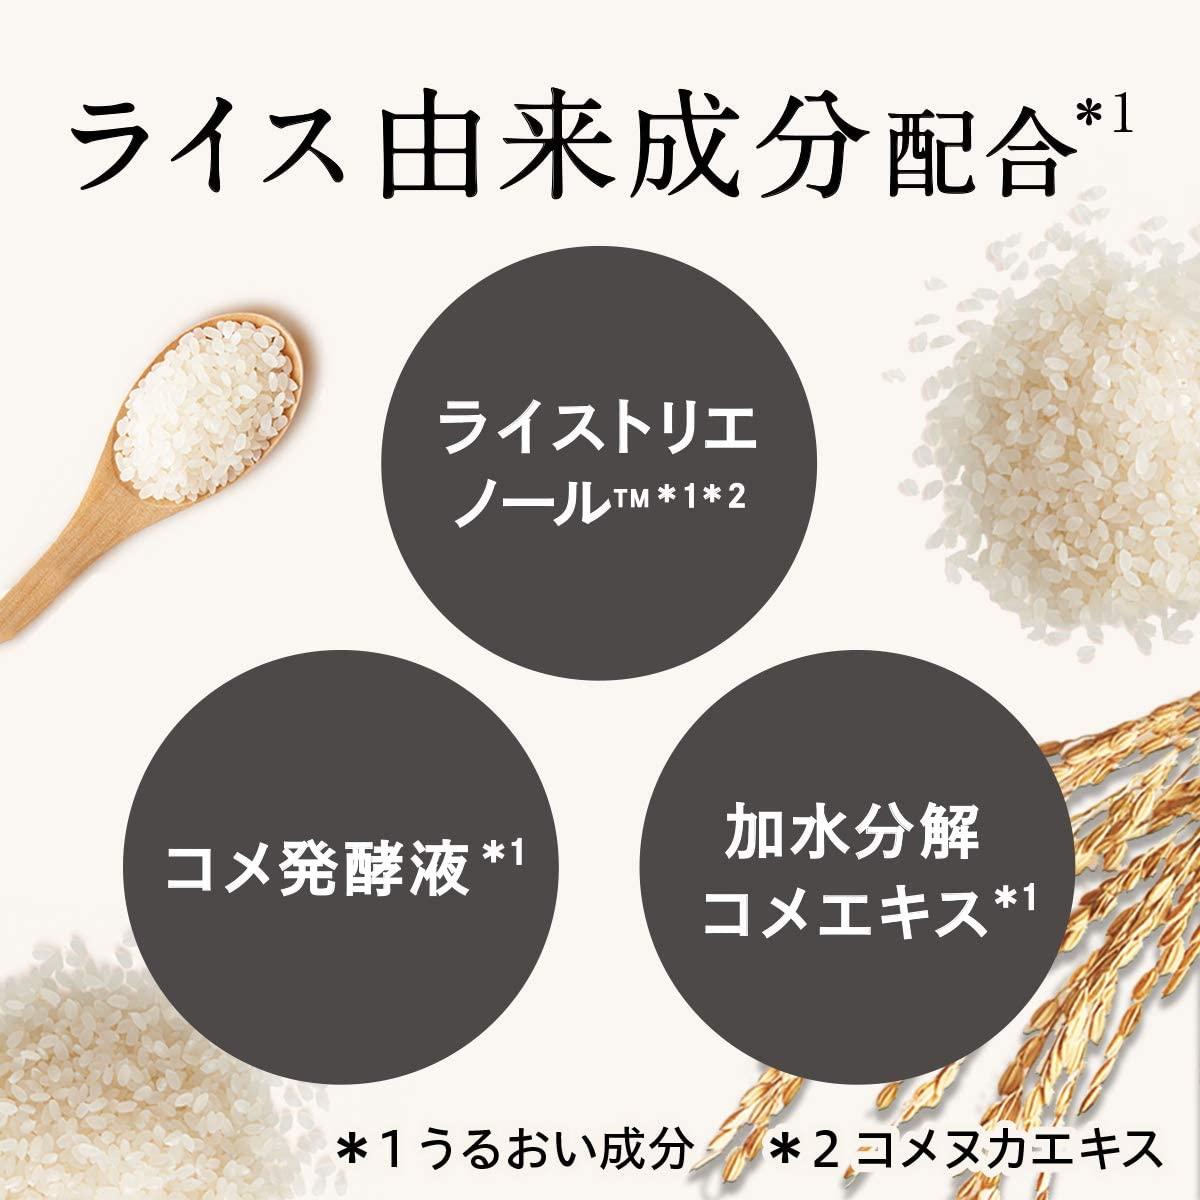 Rice Release(ライスリリース) クレンジングオイルの商品画像5